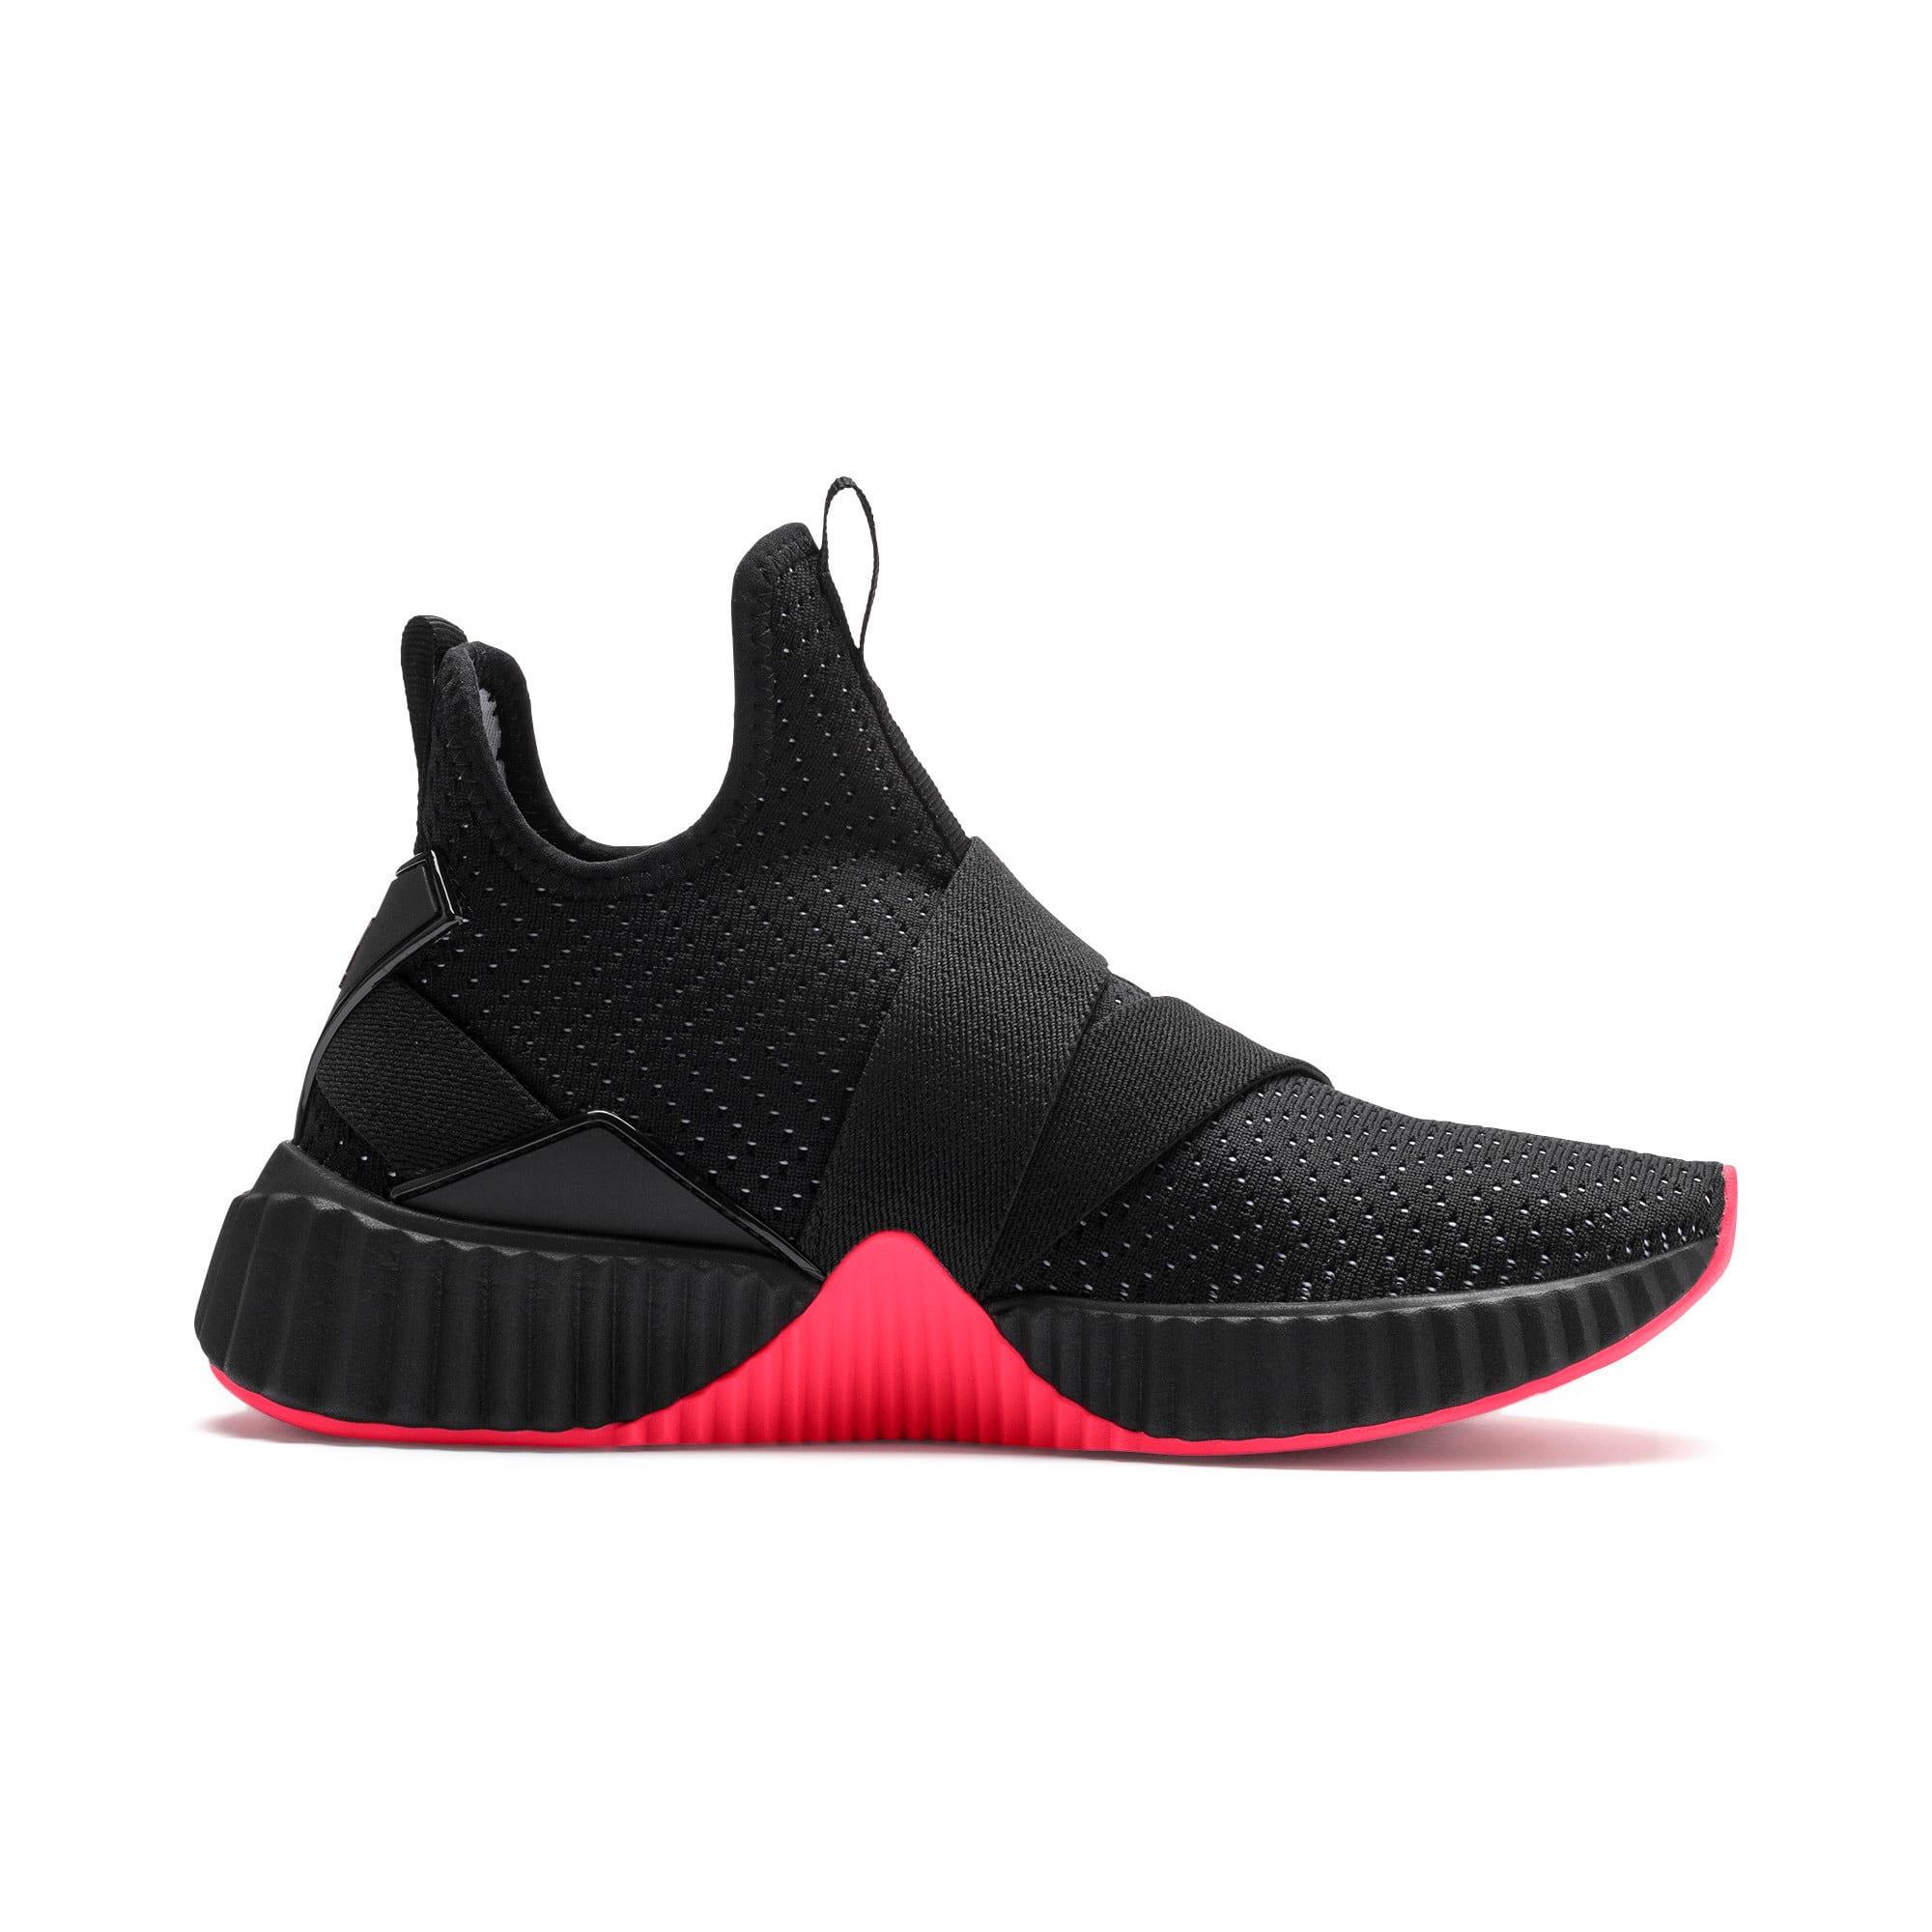 Thumbnail 6 of Defy Mid Core Women's Training Shoes, Puma Black-Pink Alert, medium